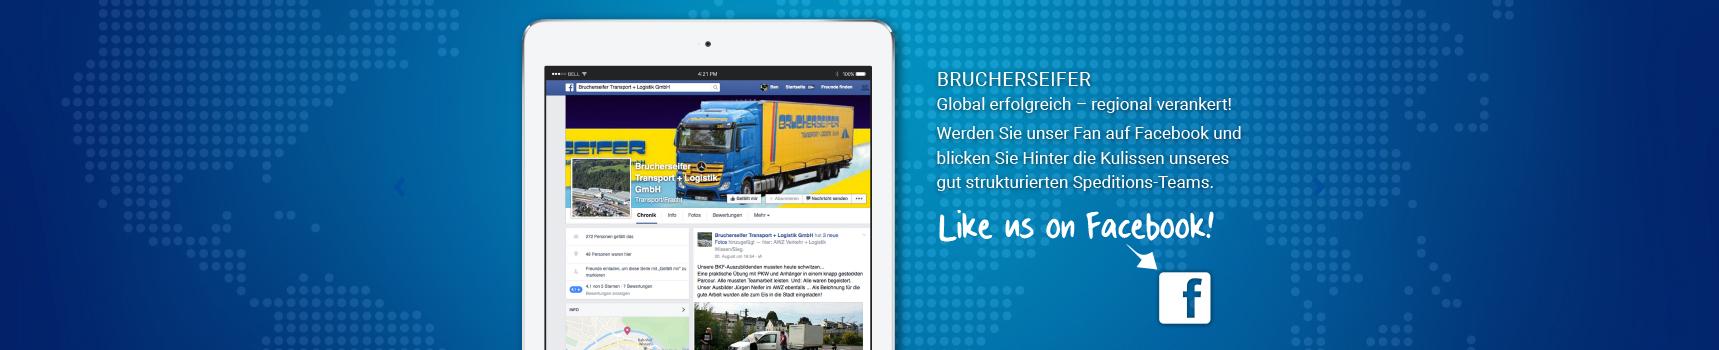 header_facebook